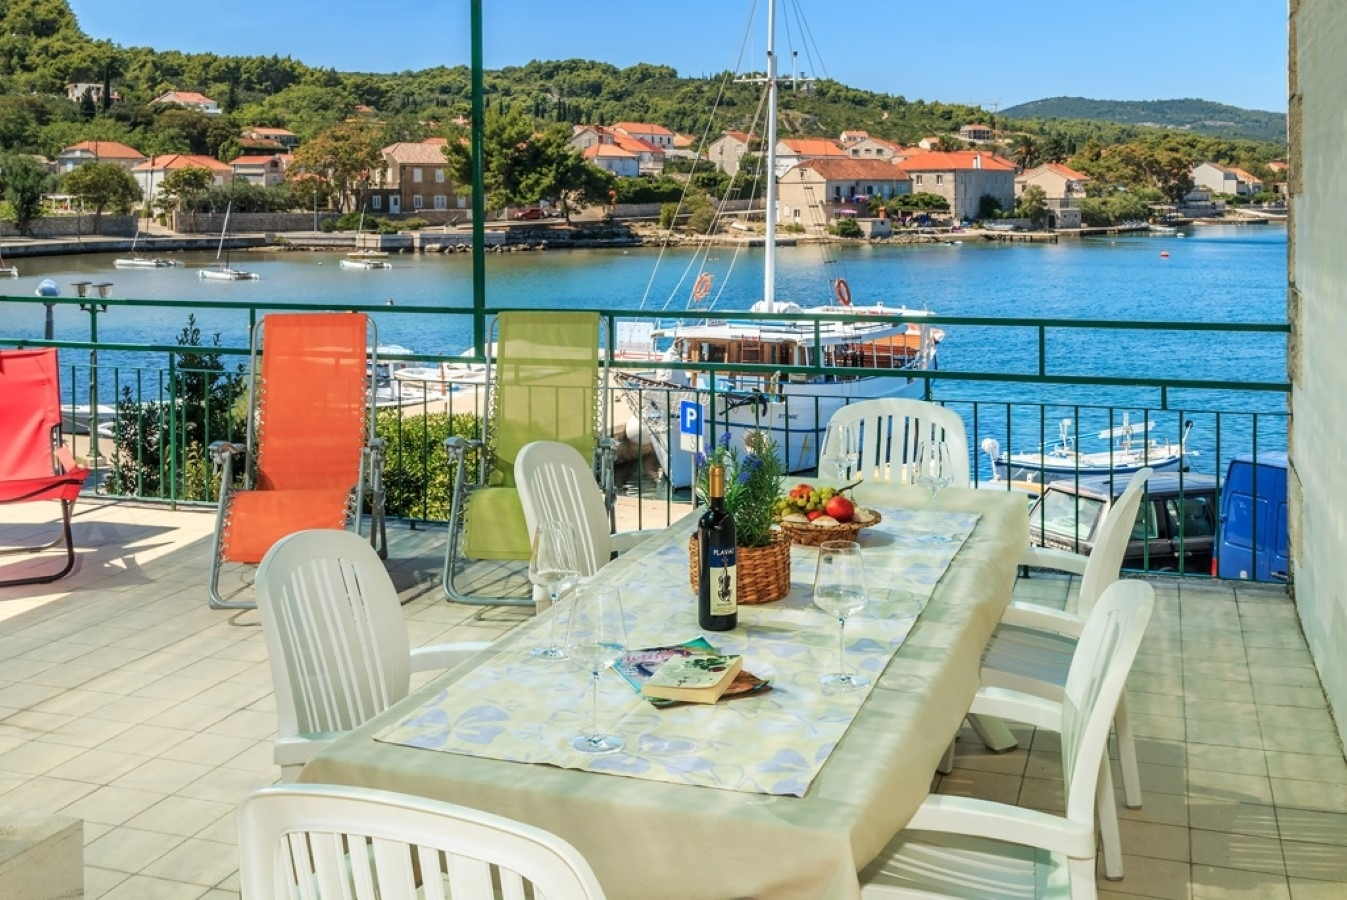 Holiday Homes, Lumbarda, Island of Korčula - Holiday houses, villas  Linda2 - 20m from the sea